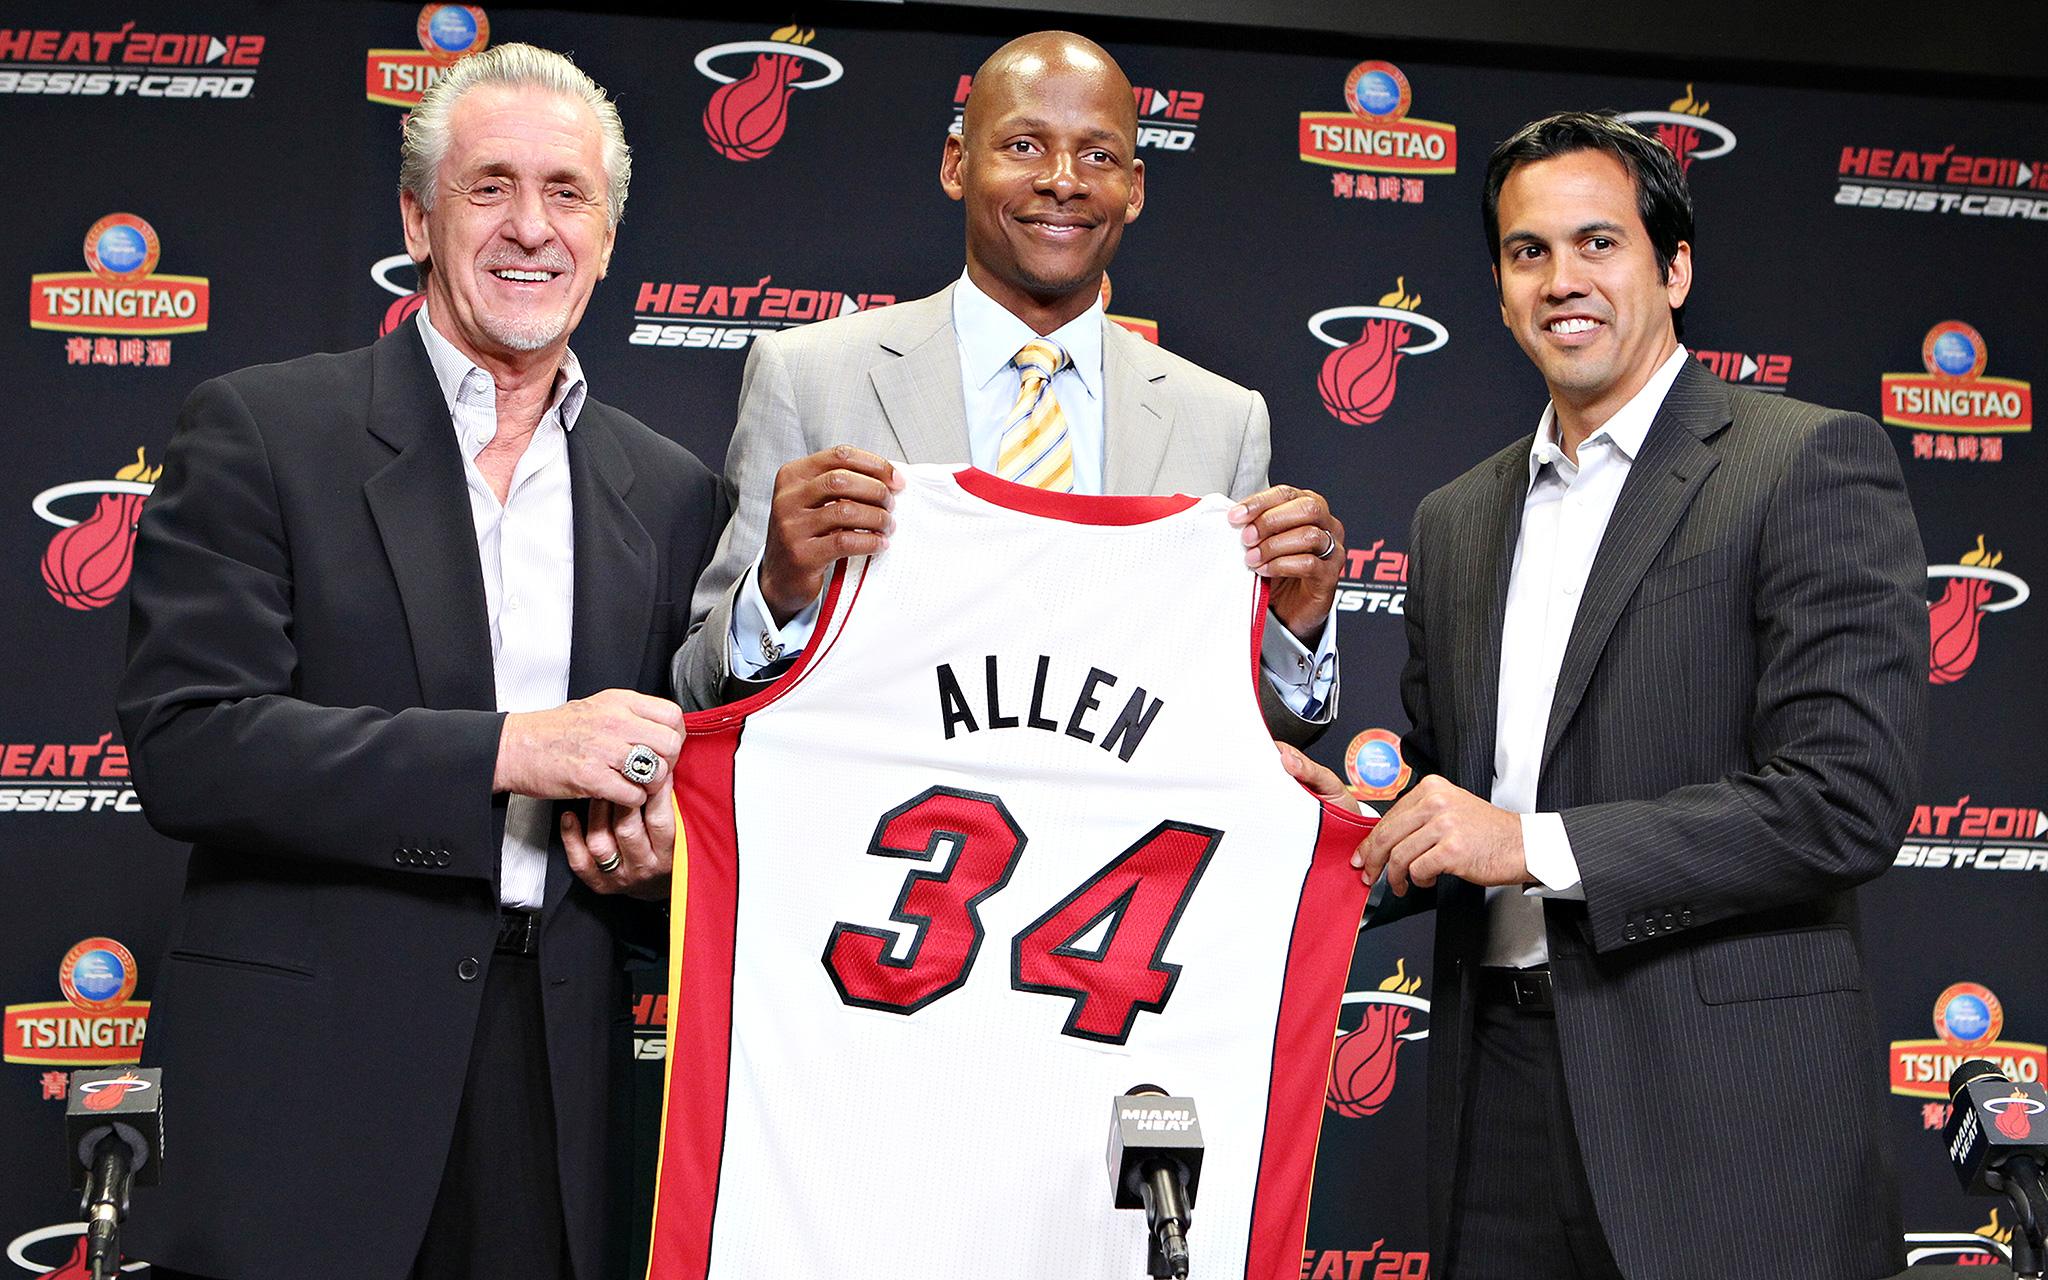 Allen Heads to Miami